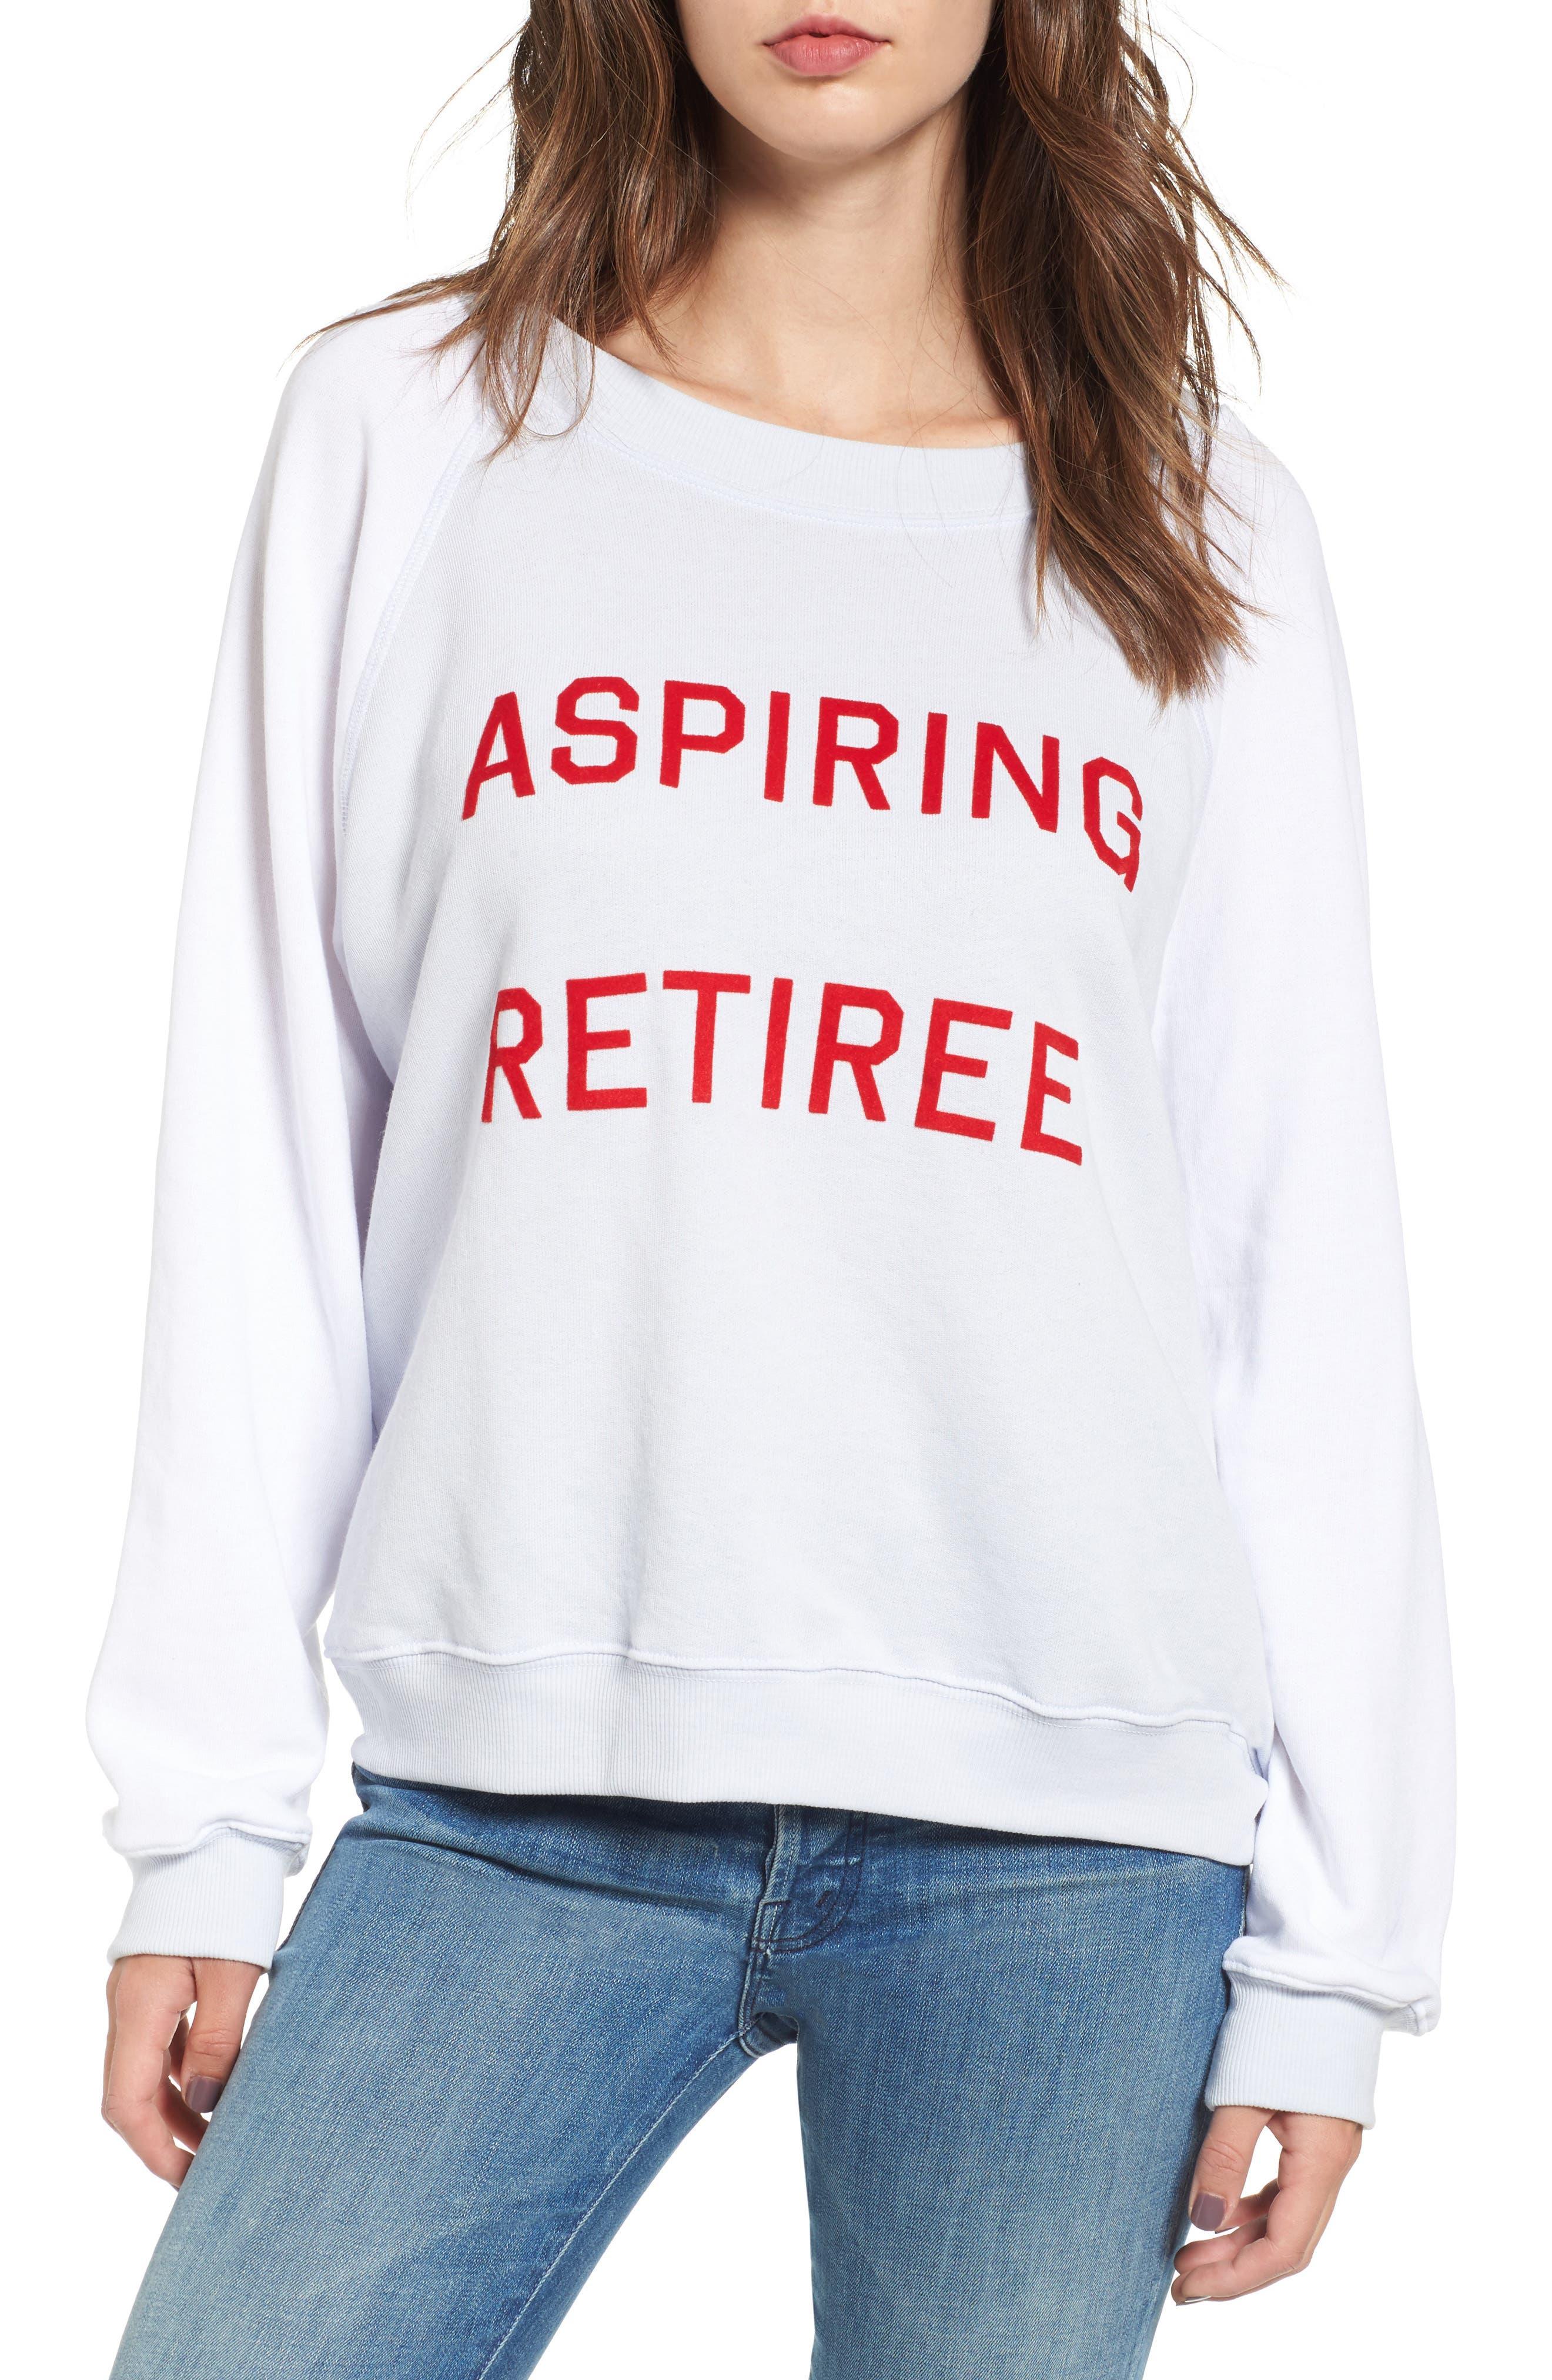 Aspiring Retiree Sweatshirt,                         Main,                         color,